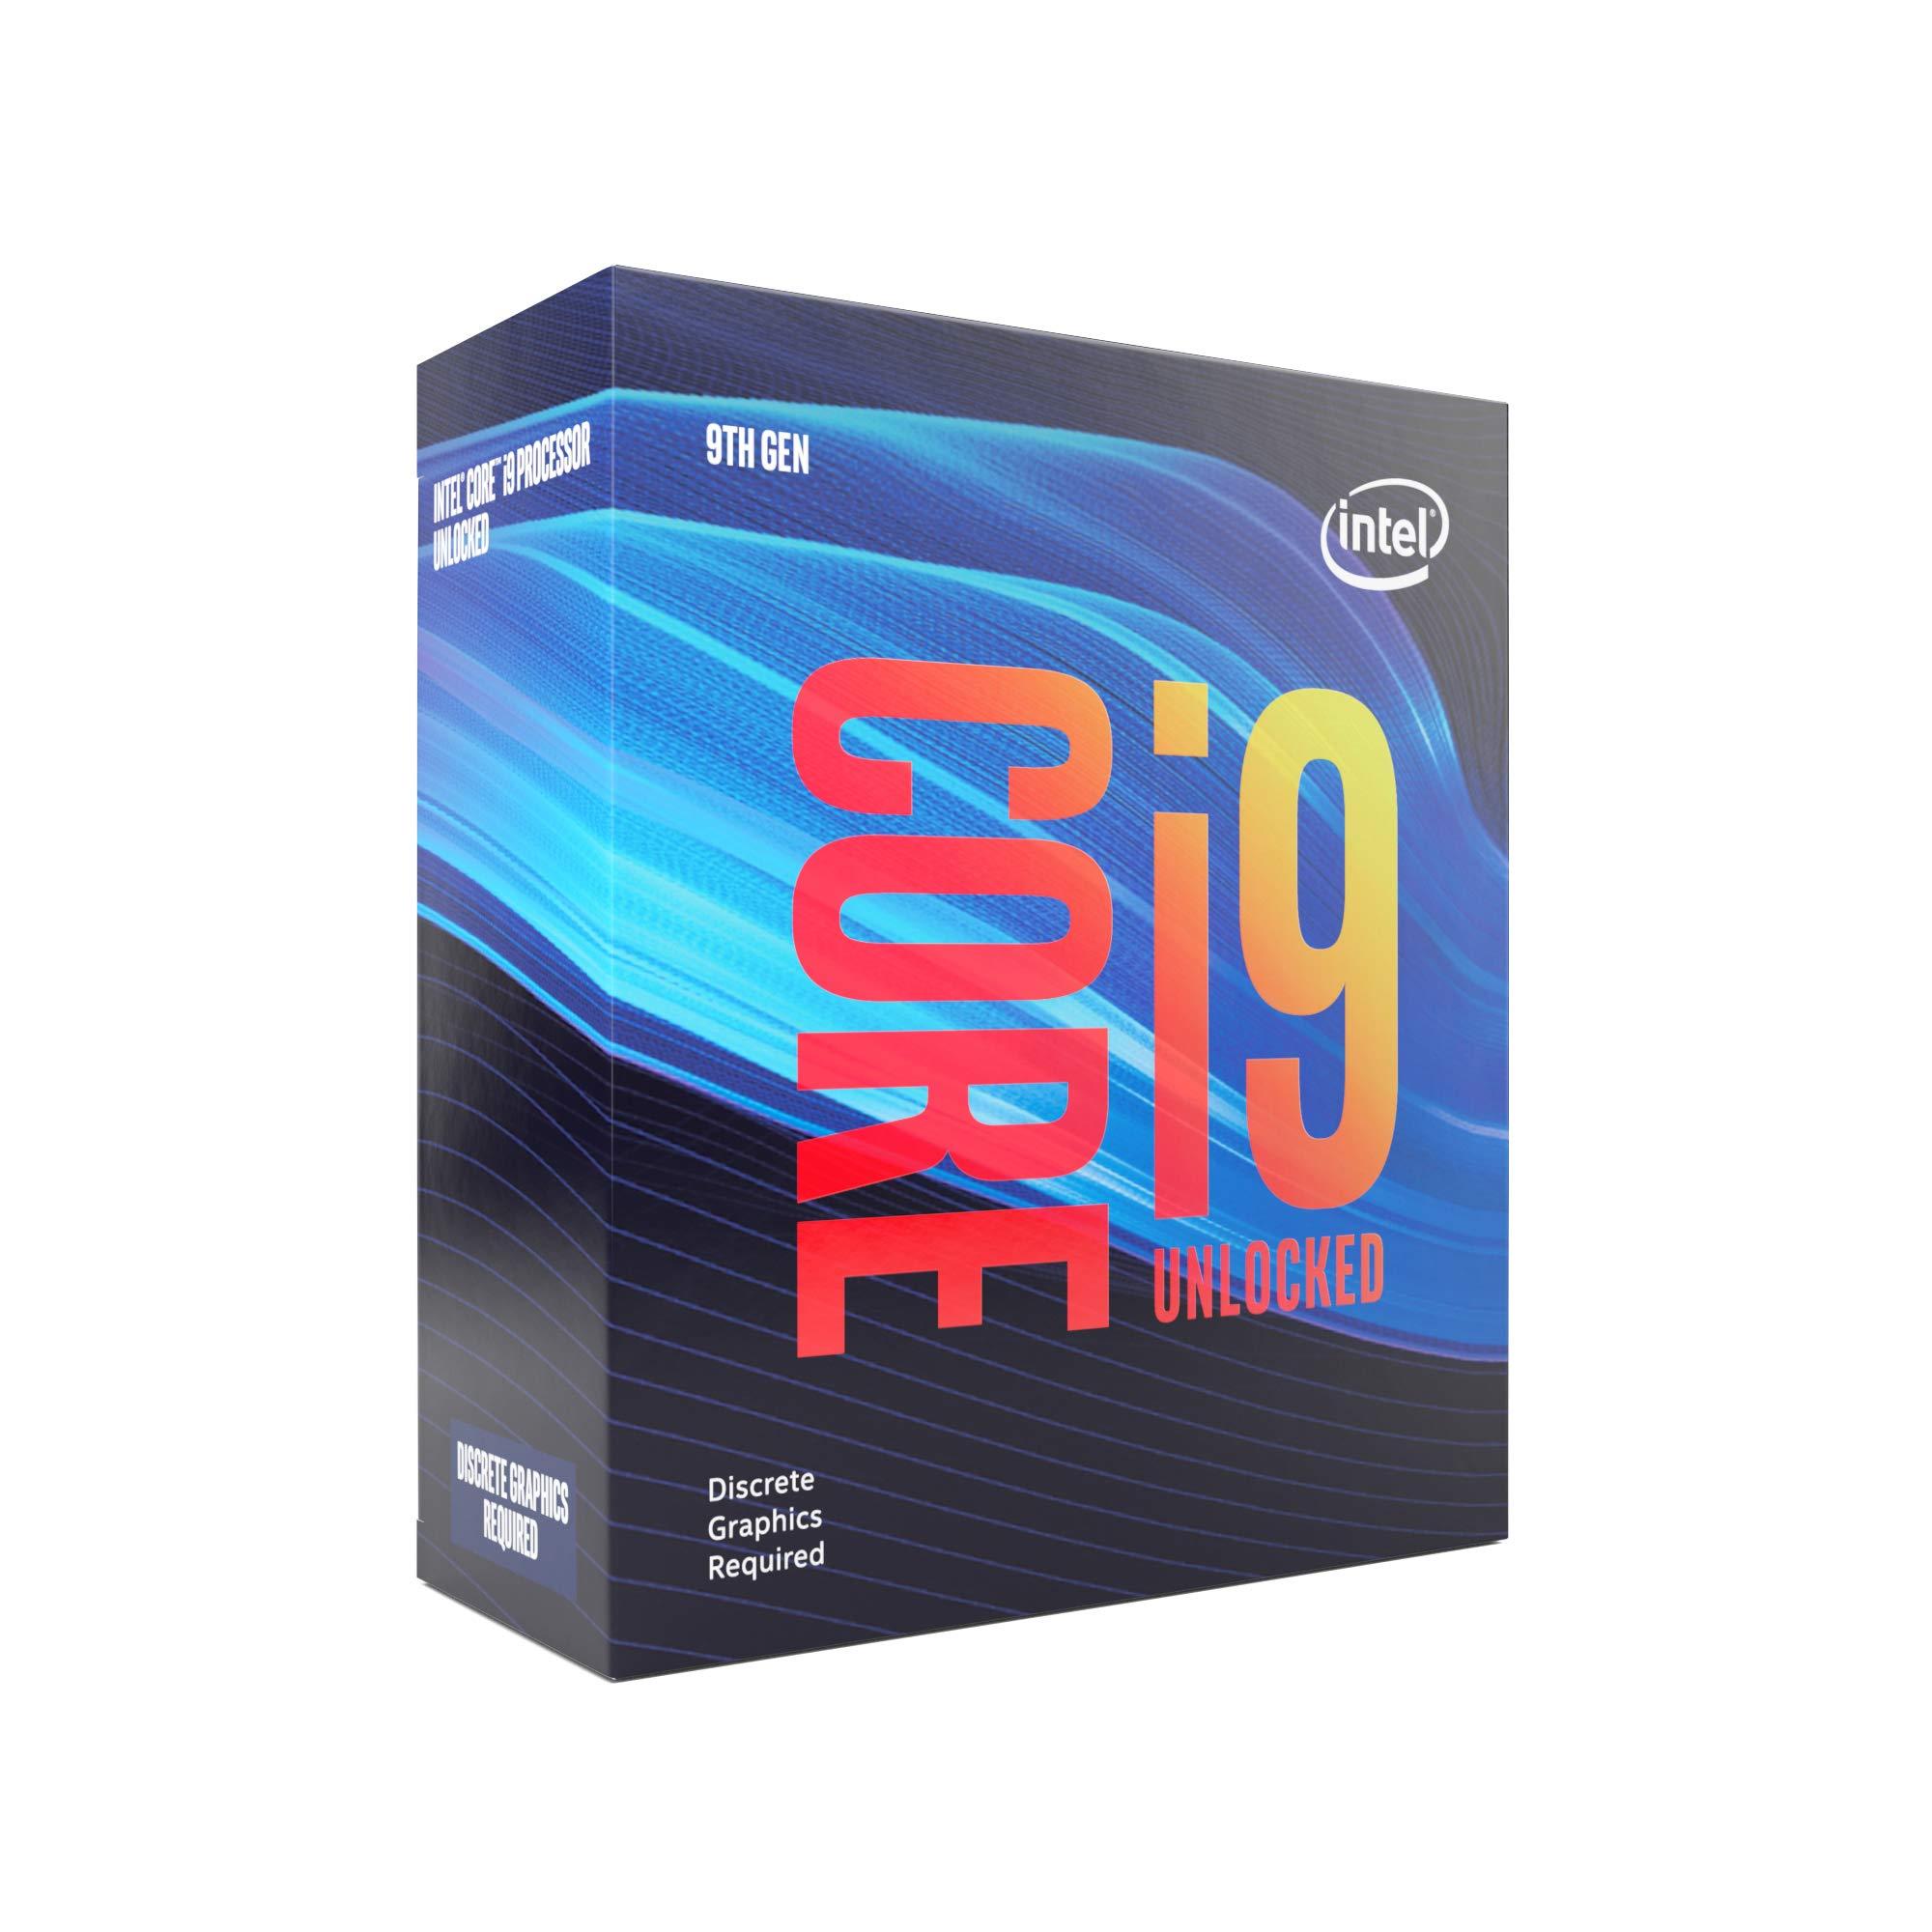 Intel BX80684I99900KF Intel Core i9-9900KF Desktop Processor 8 Cores up to 5.0 GHz Turbo Unlocked Without Processor Graphics LGA1151 300 Series 95W